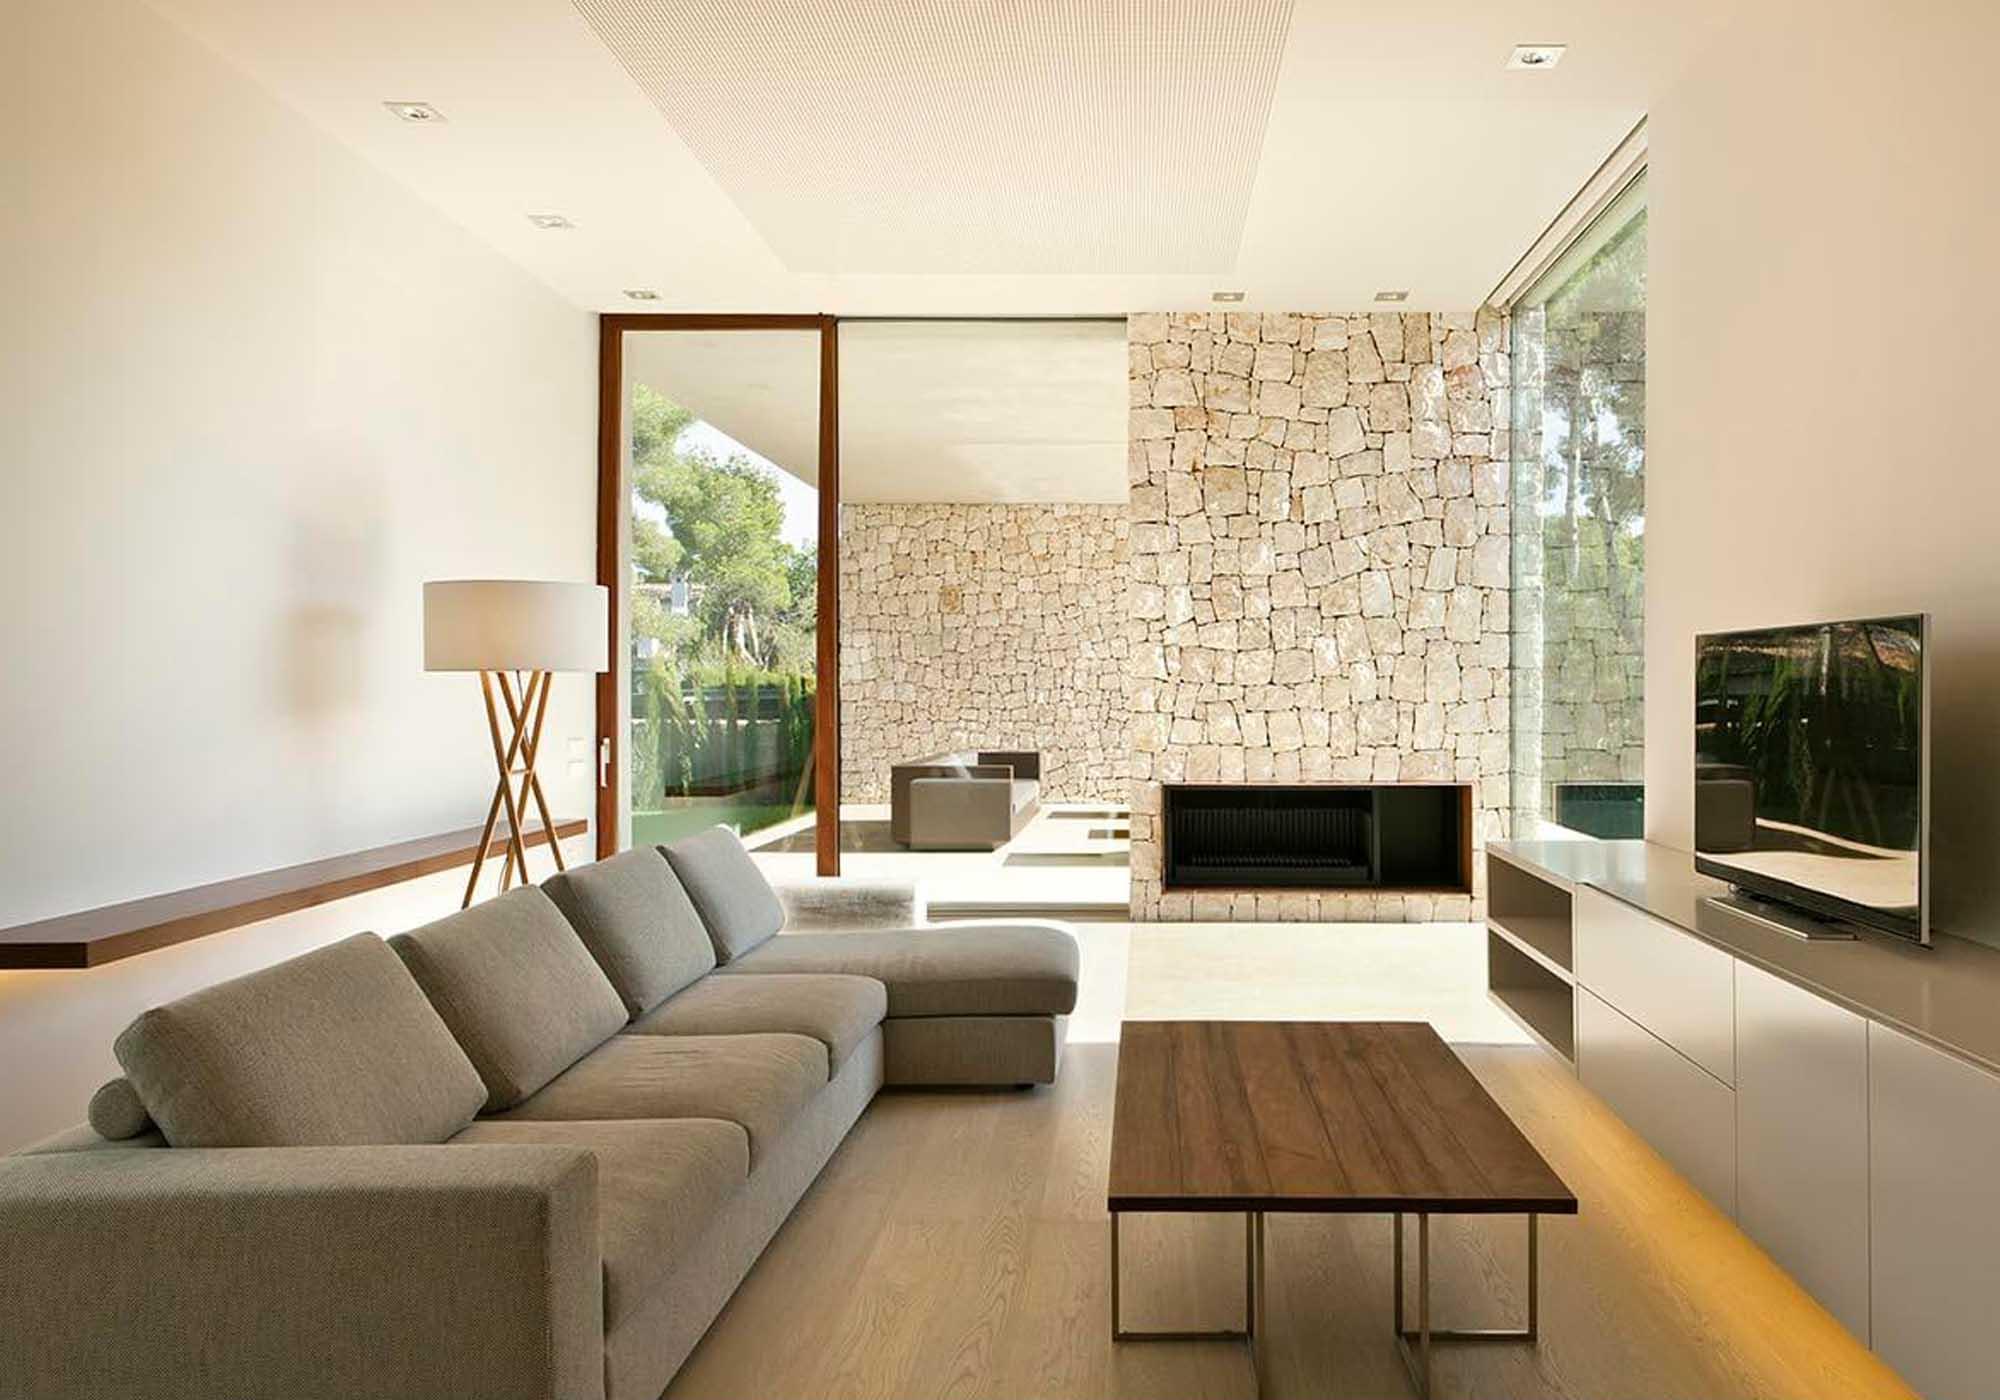 sala com decoração minimalista